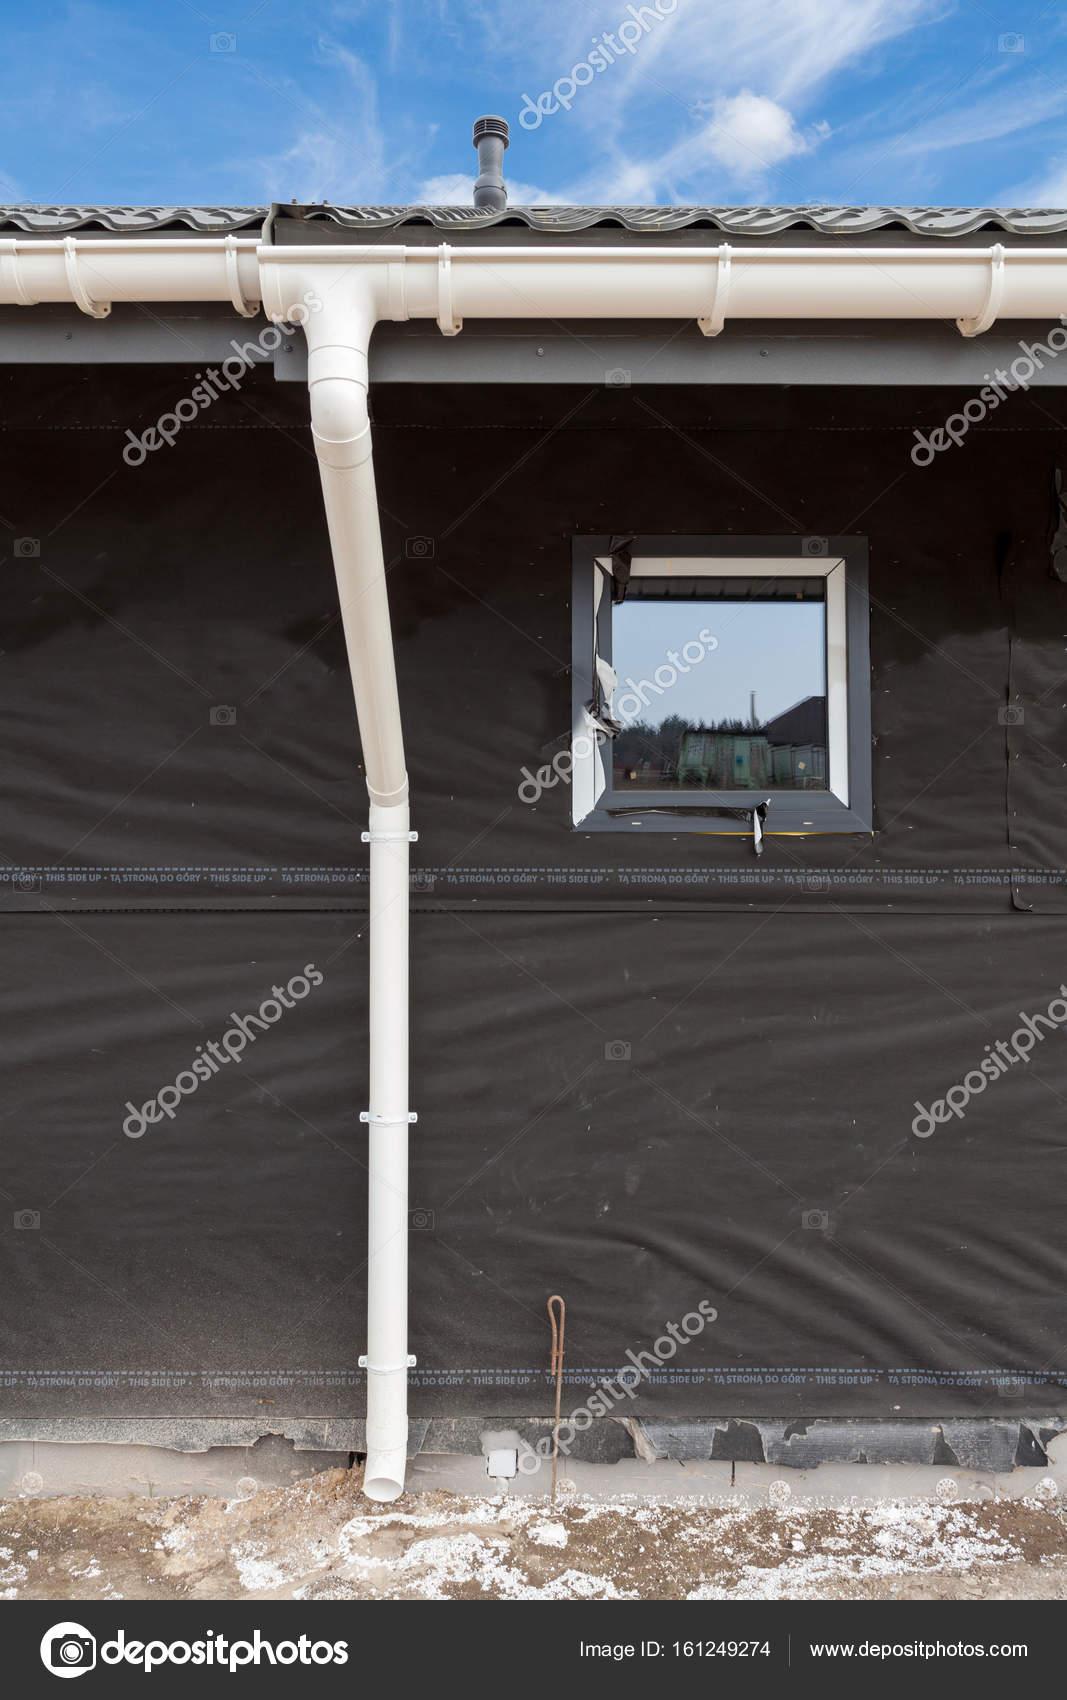 sip panel hausbau neues grau metall ziegel dach mit wei en regenrinne stockfoto brizmaker. Black Bedroom Furniture Sets. Home Design Ideas